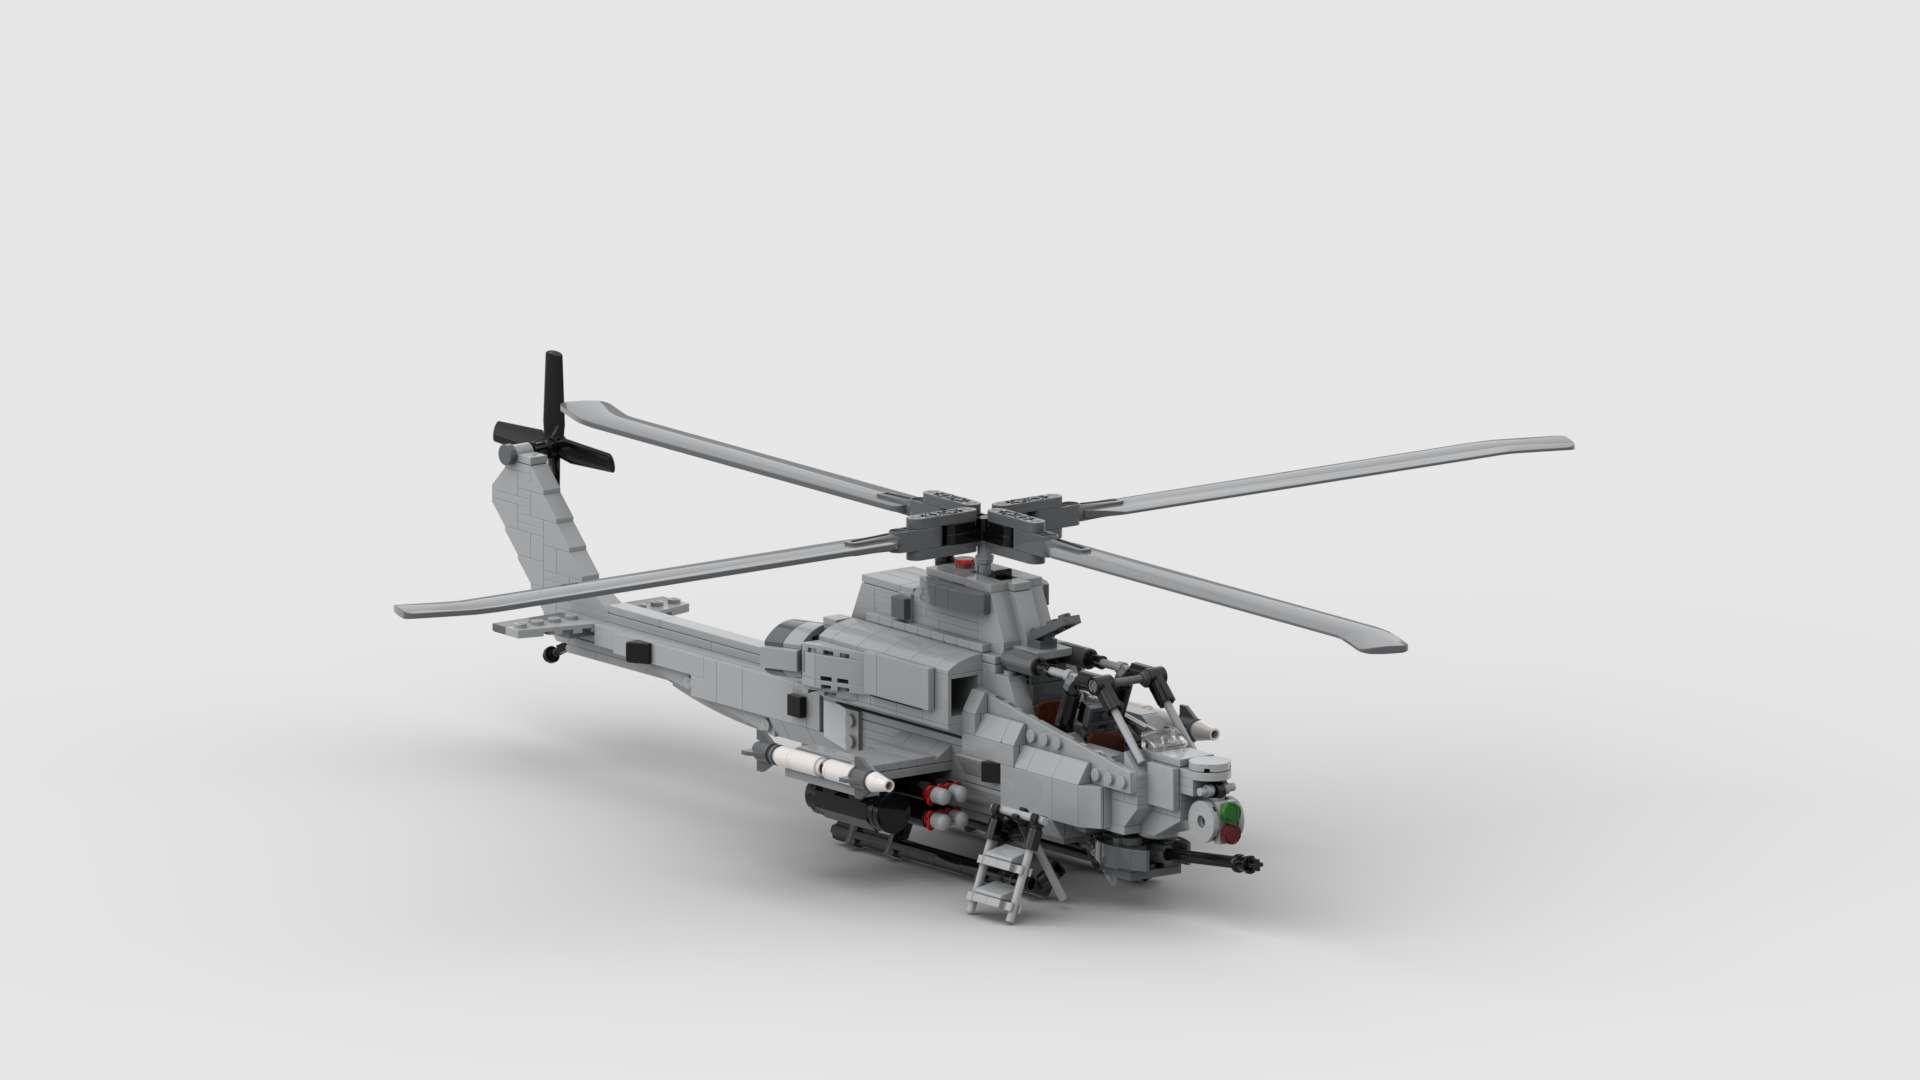 http://mistercreator.de/produkt/lego-super-cobra-helikopter-in-minifigur-massstab/